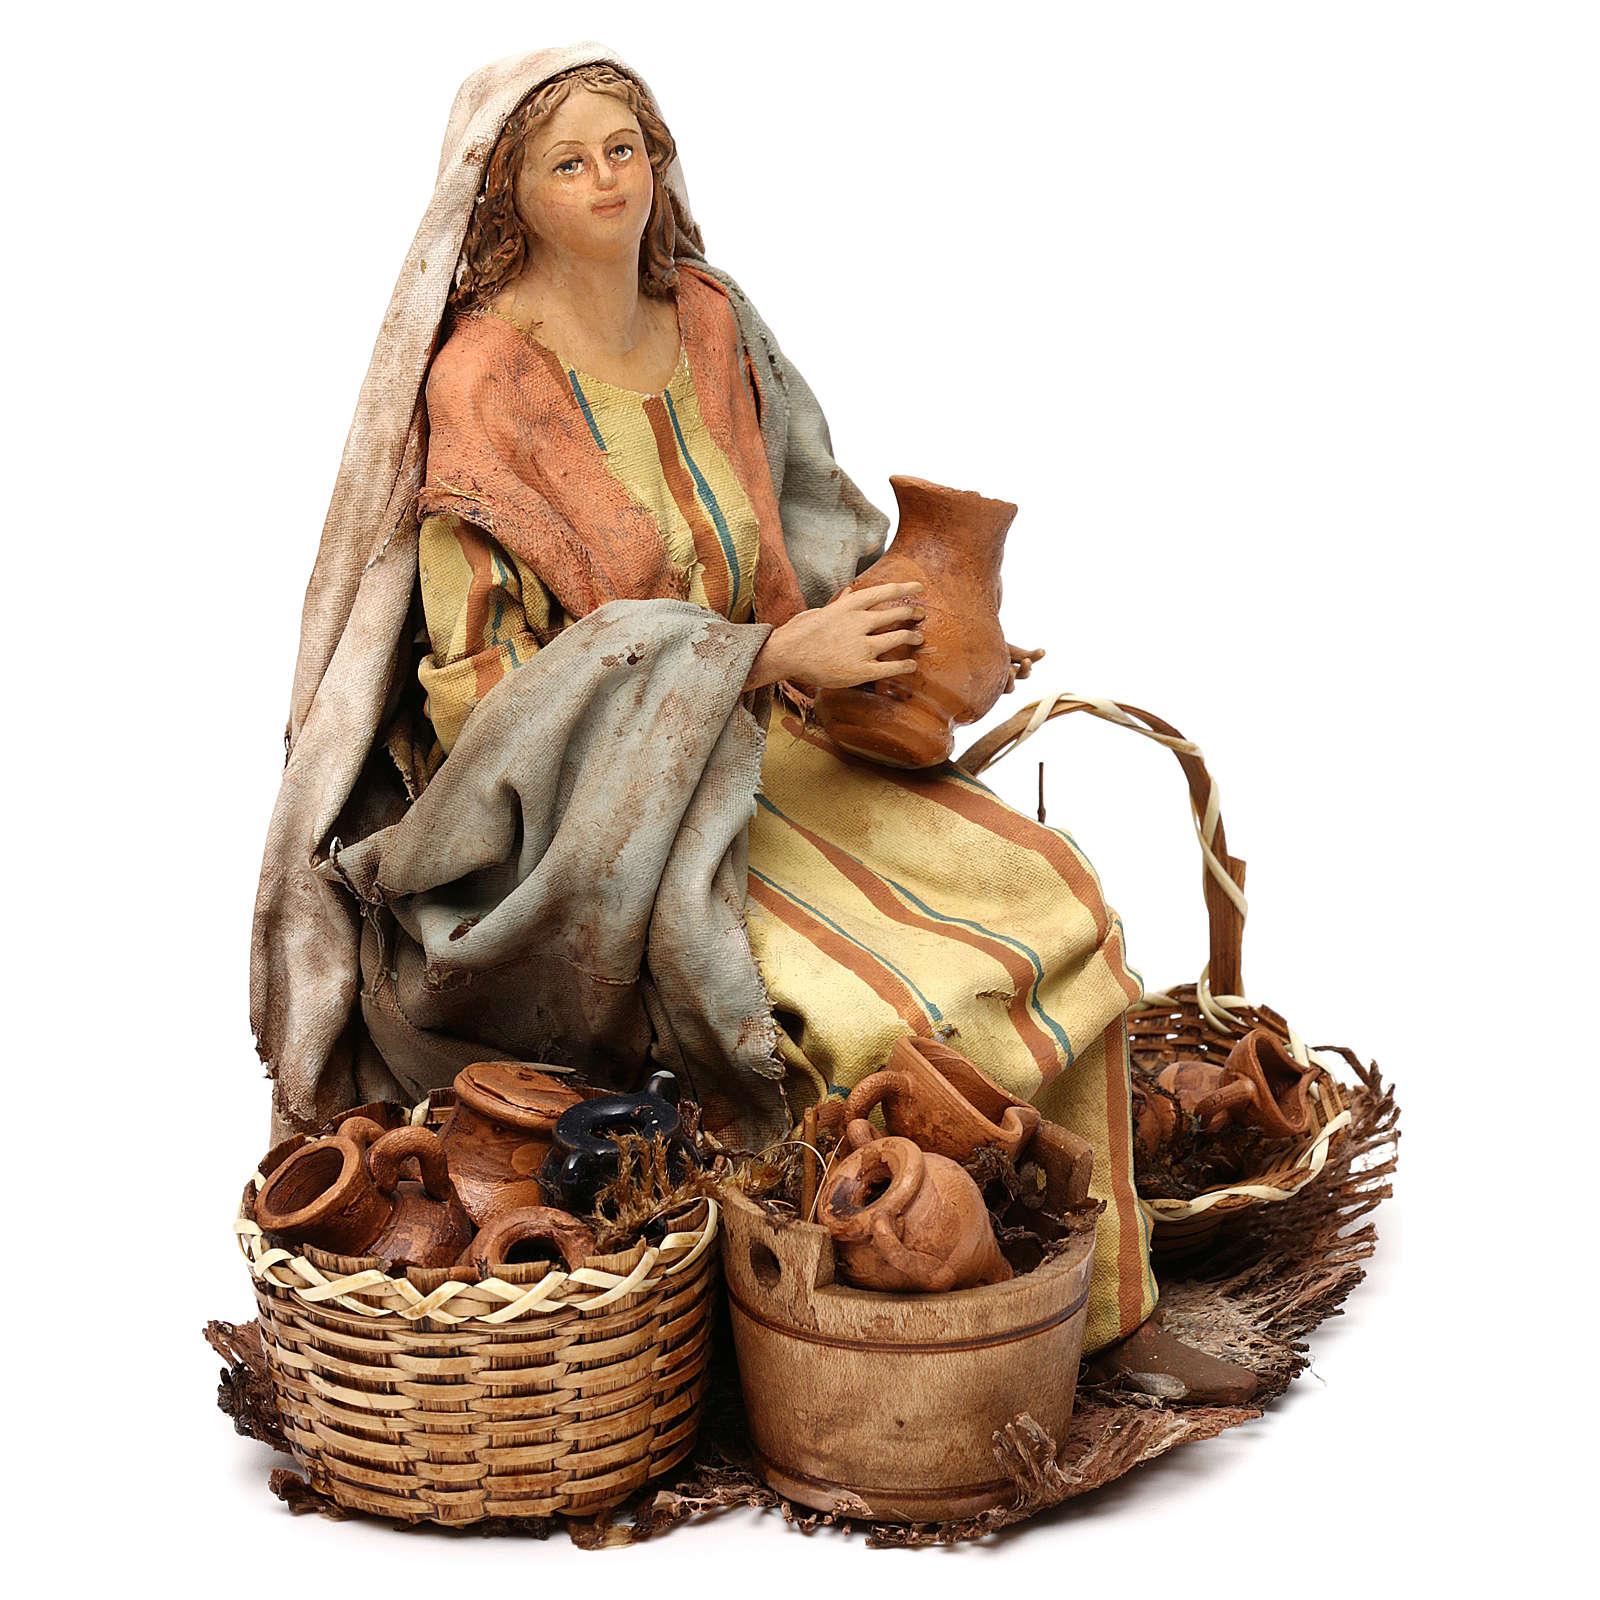 Nativity Scene figurine Woman selling vases, Angela Tripi 18 cm 4